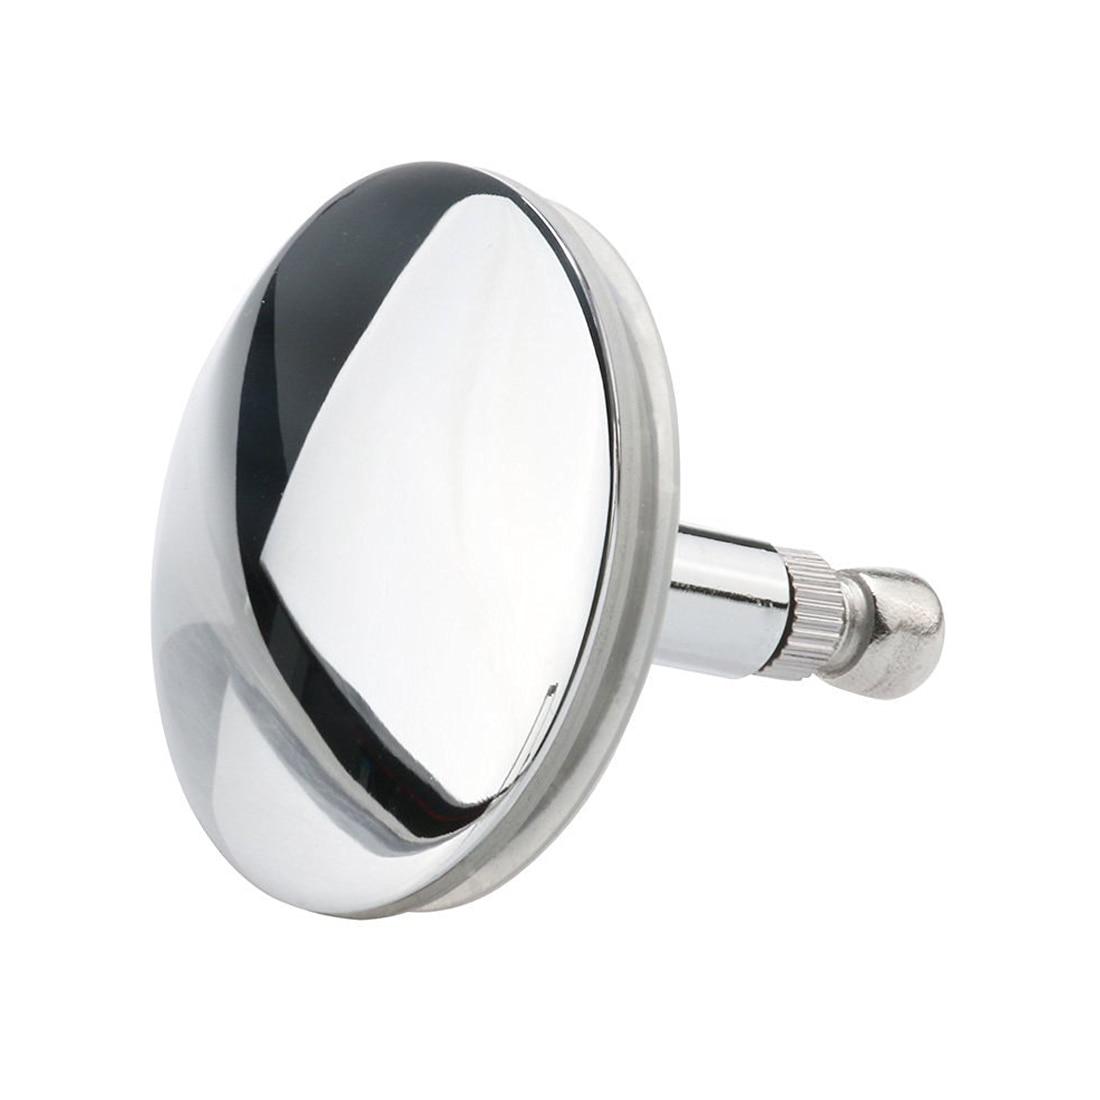 New Chrome Bathtub Basin Drain Stopper Plug Bathroom Bath Plug Bathtub Drain Silver Plug Alarm Plug Silversilver Flat Aliexpress